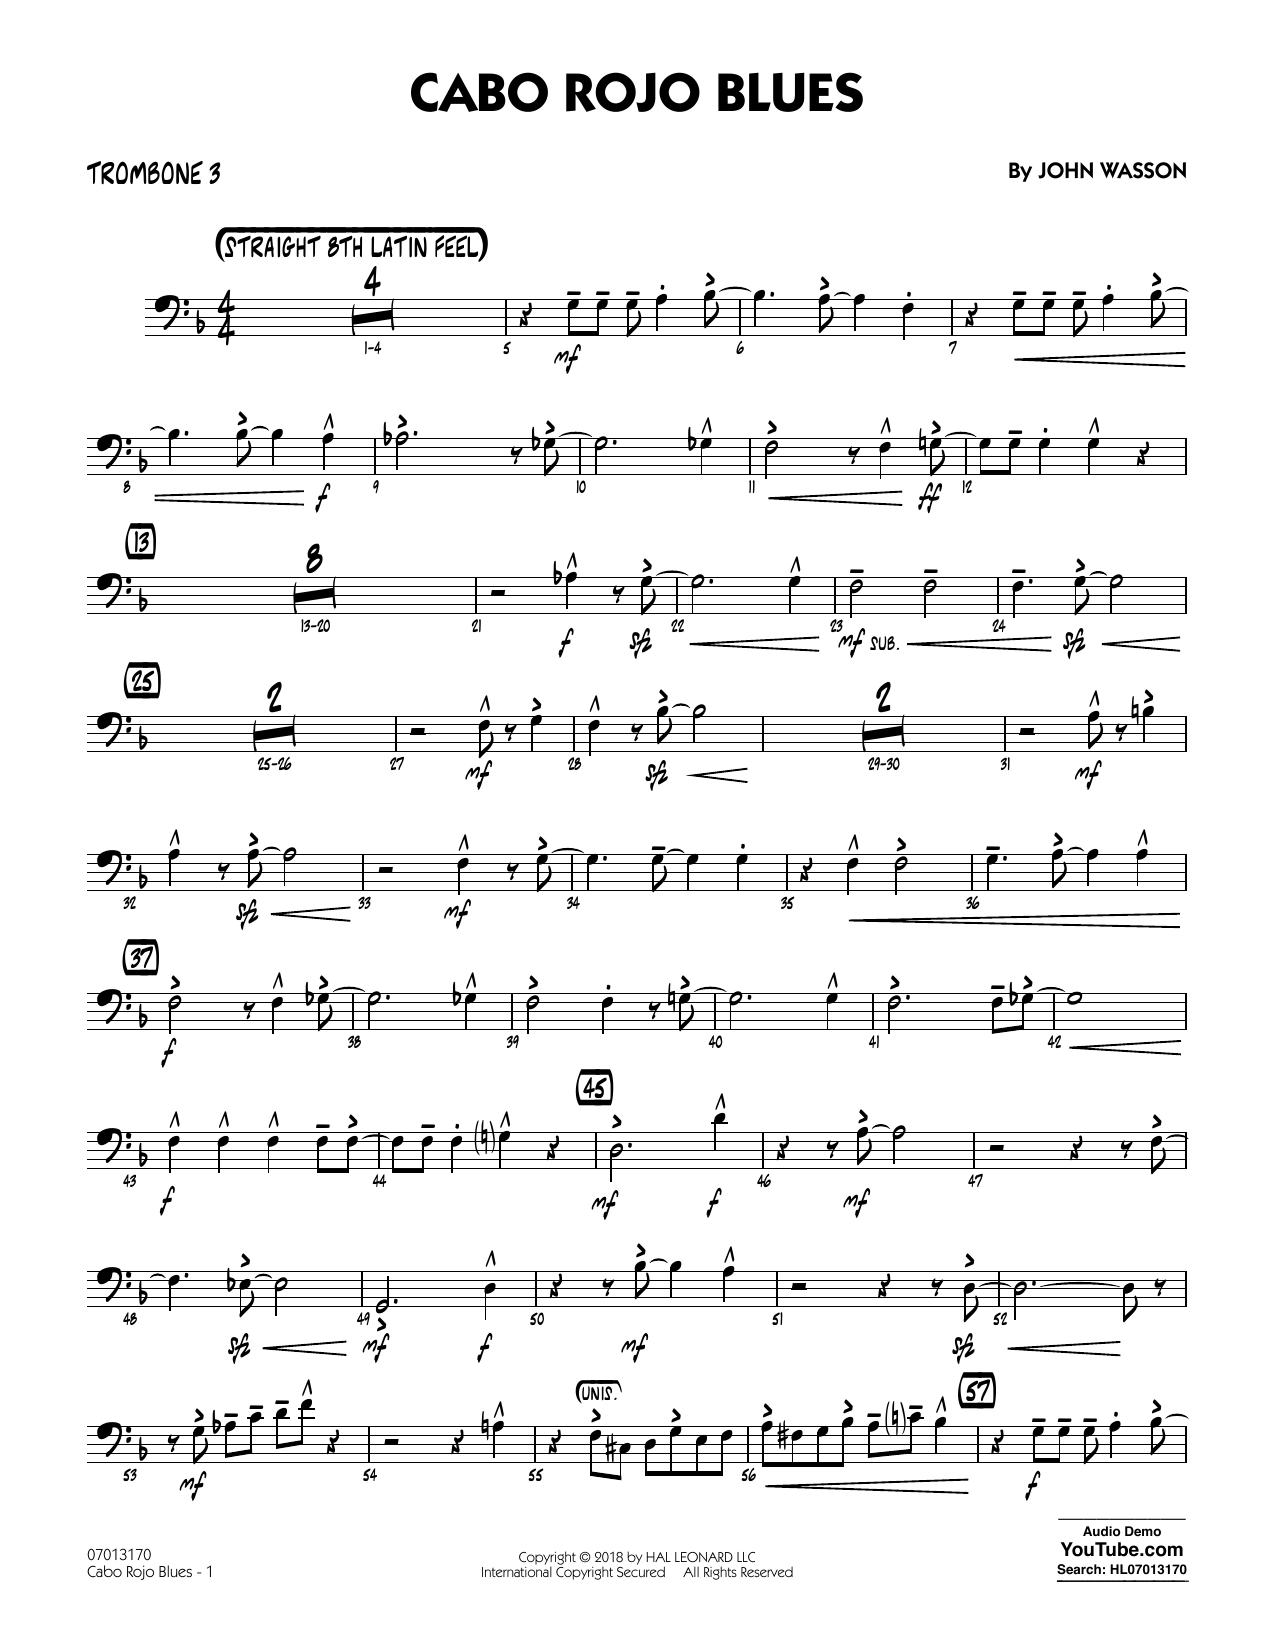 John Wasson Cabo Rojo Blues - Trombone 3 sheet music notes and chords. Download Printable PDF.